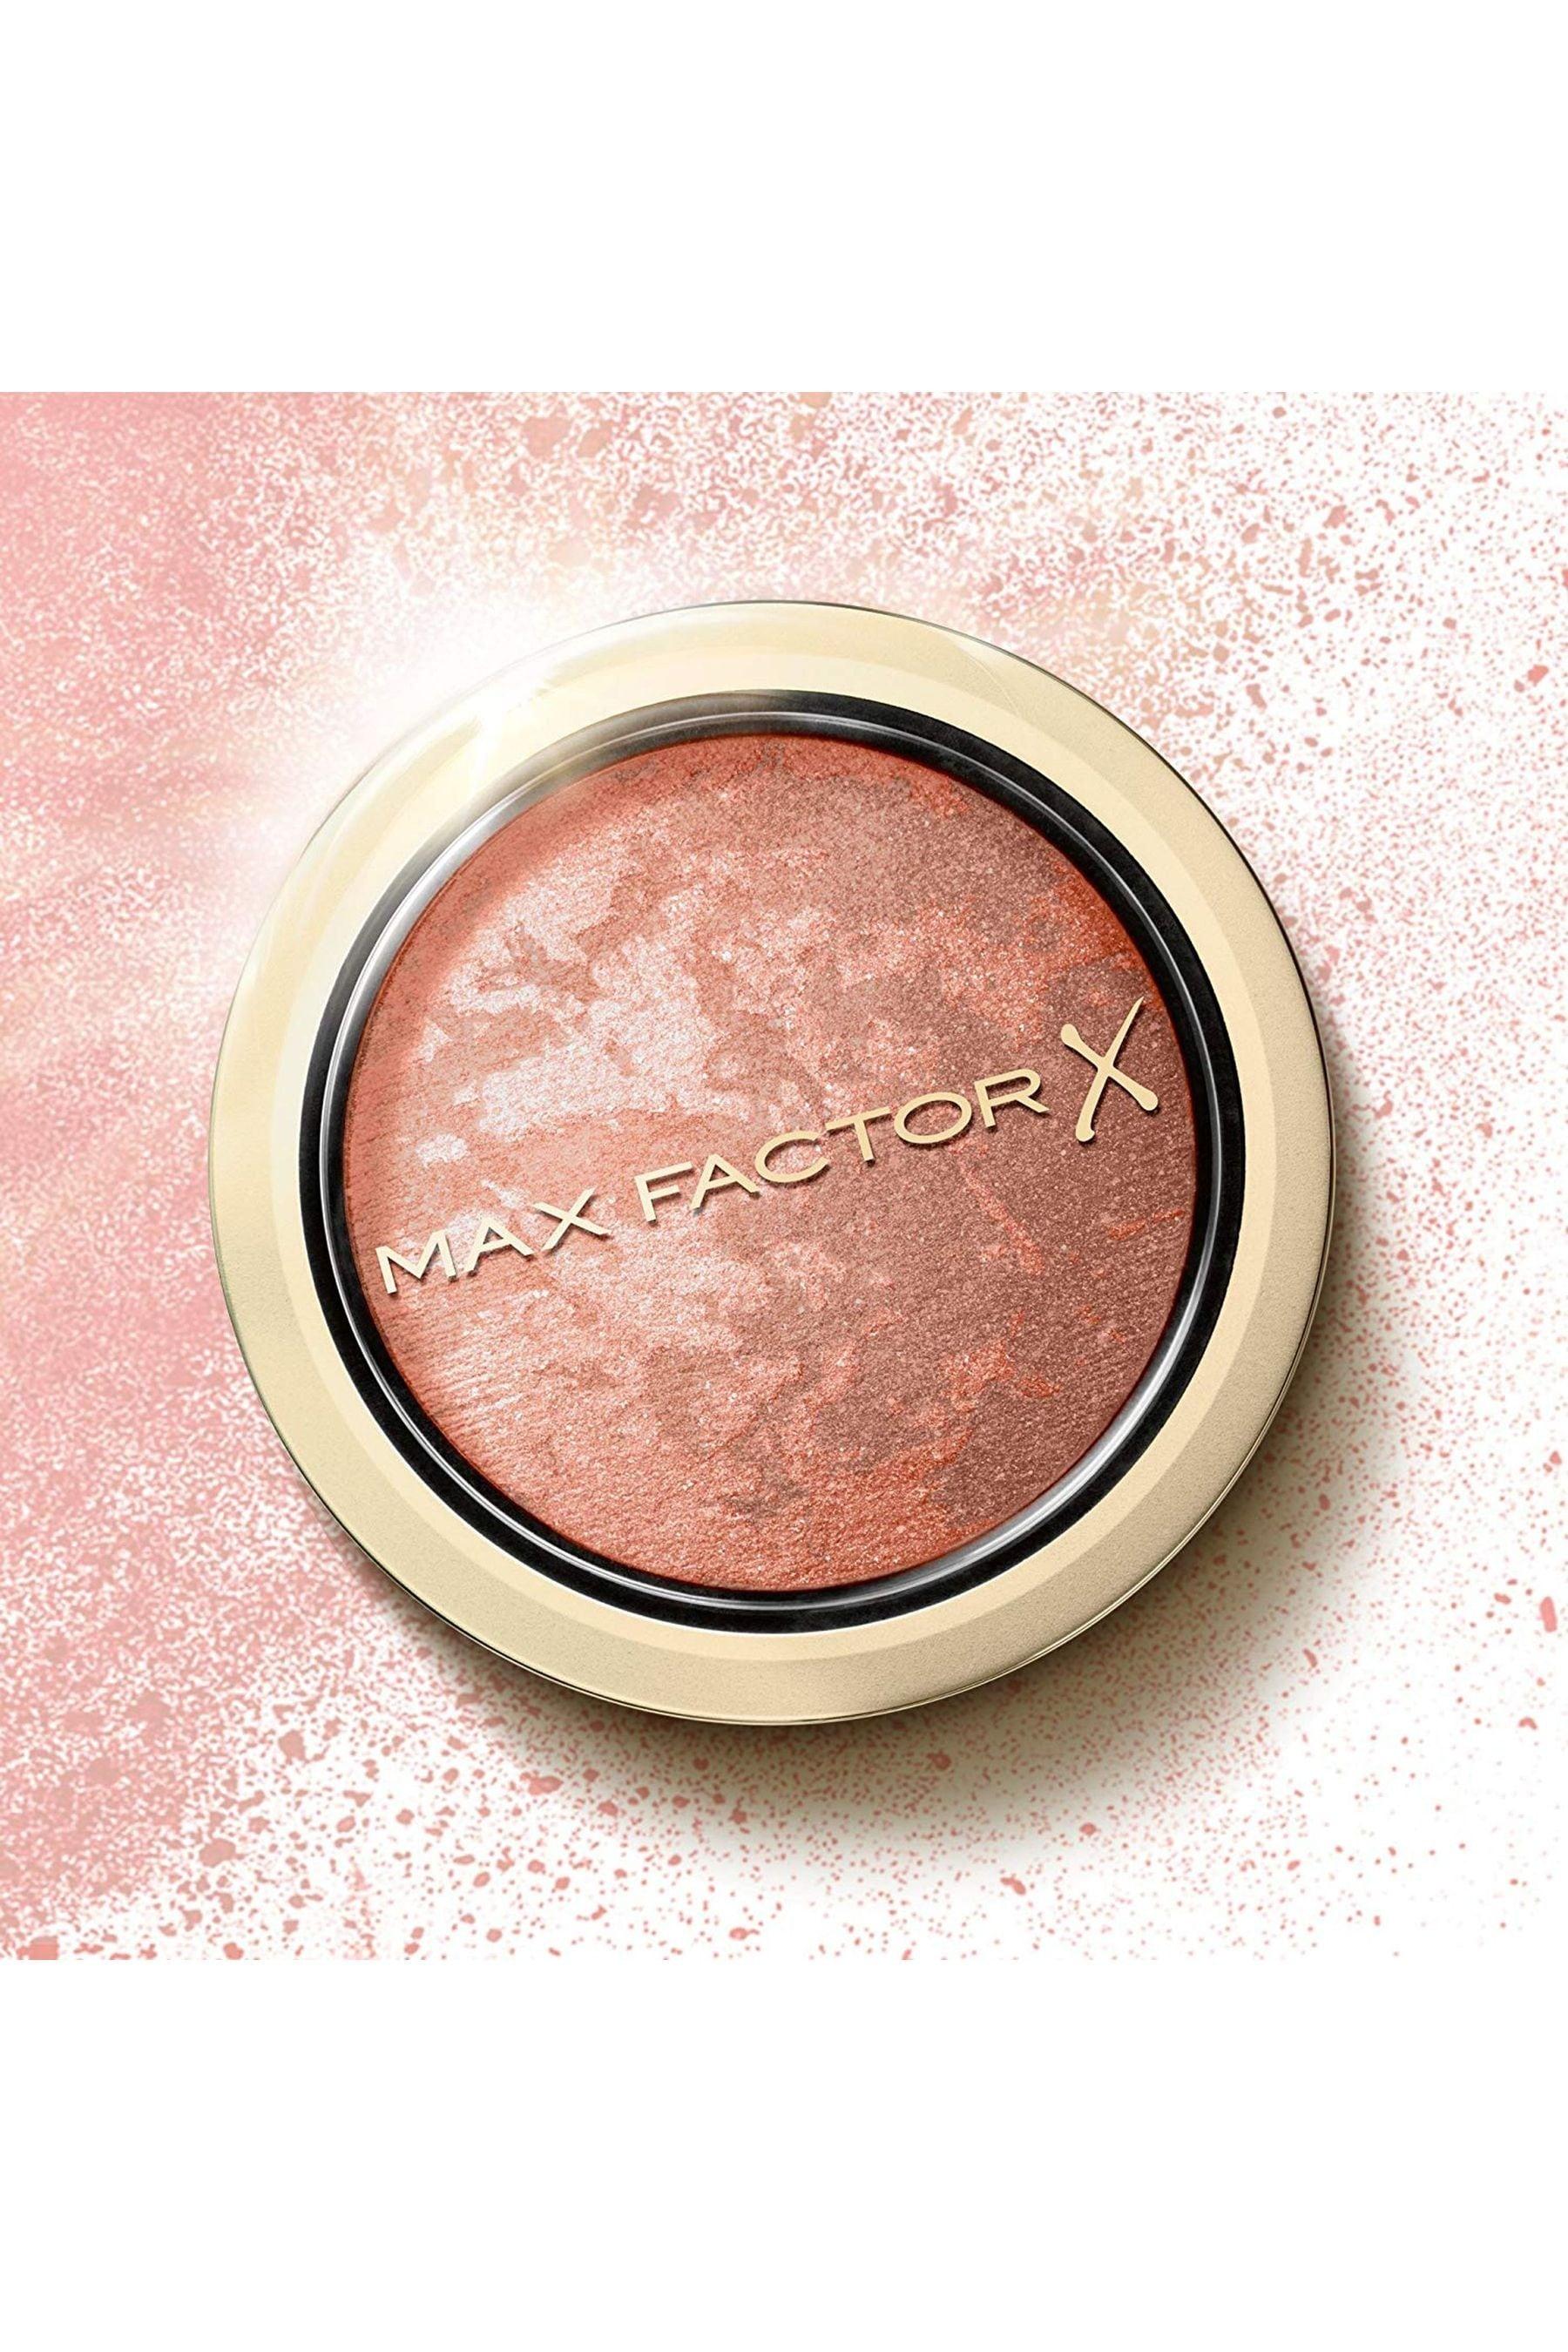 Buy Max Factor Creme Puff Powder Blush 10 Nude Mauve 1pc